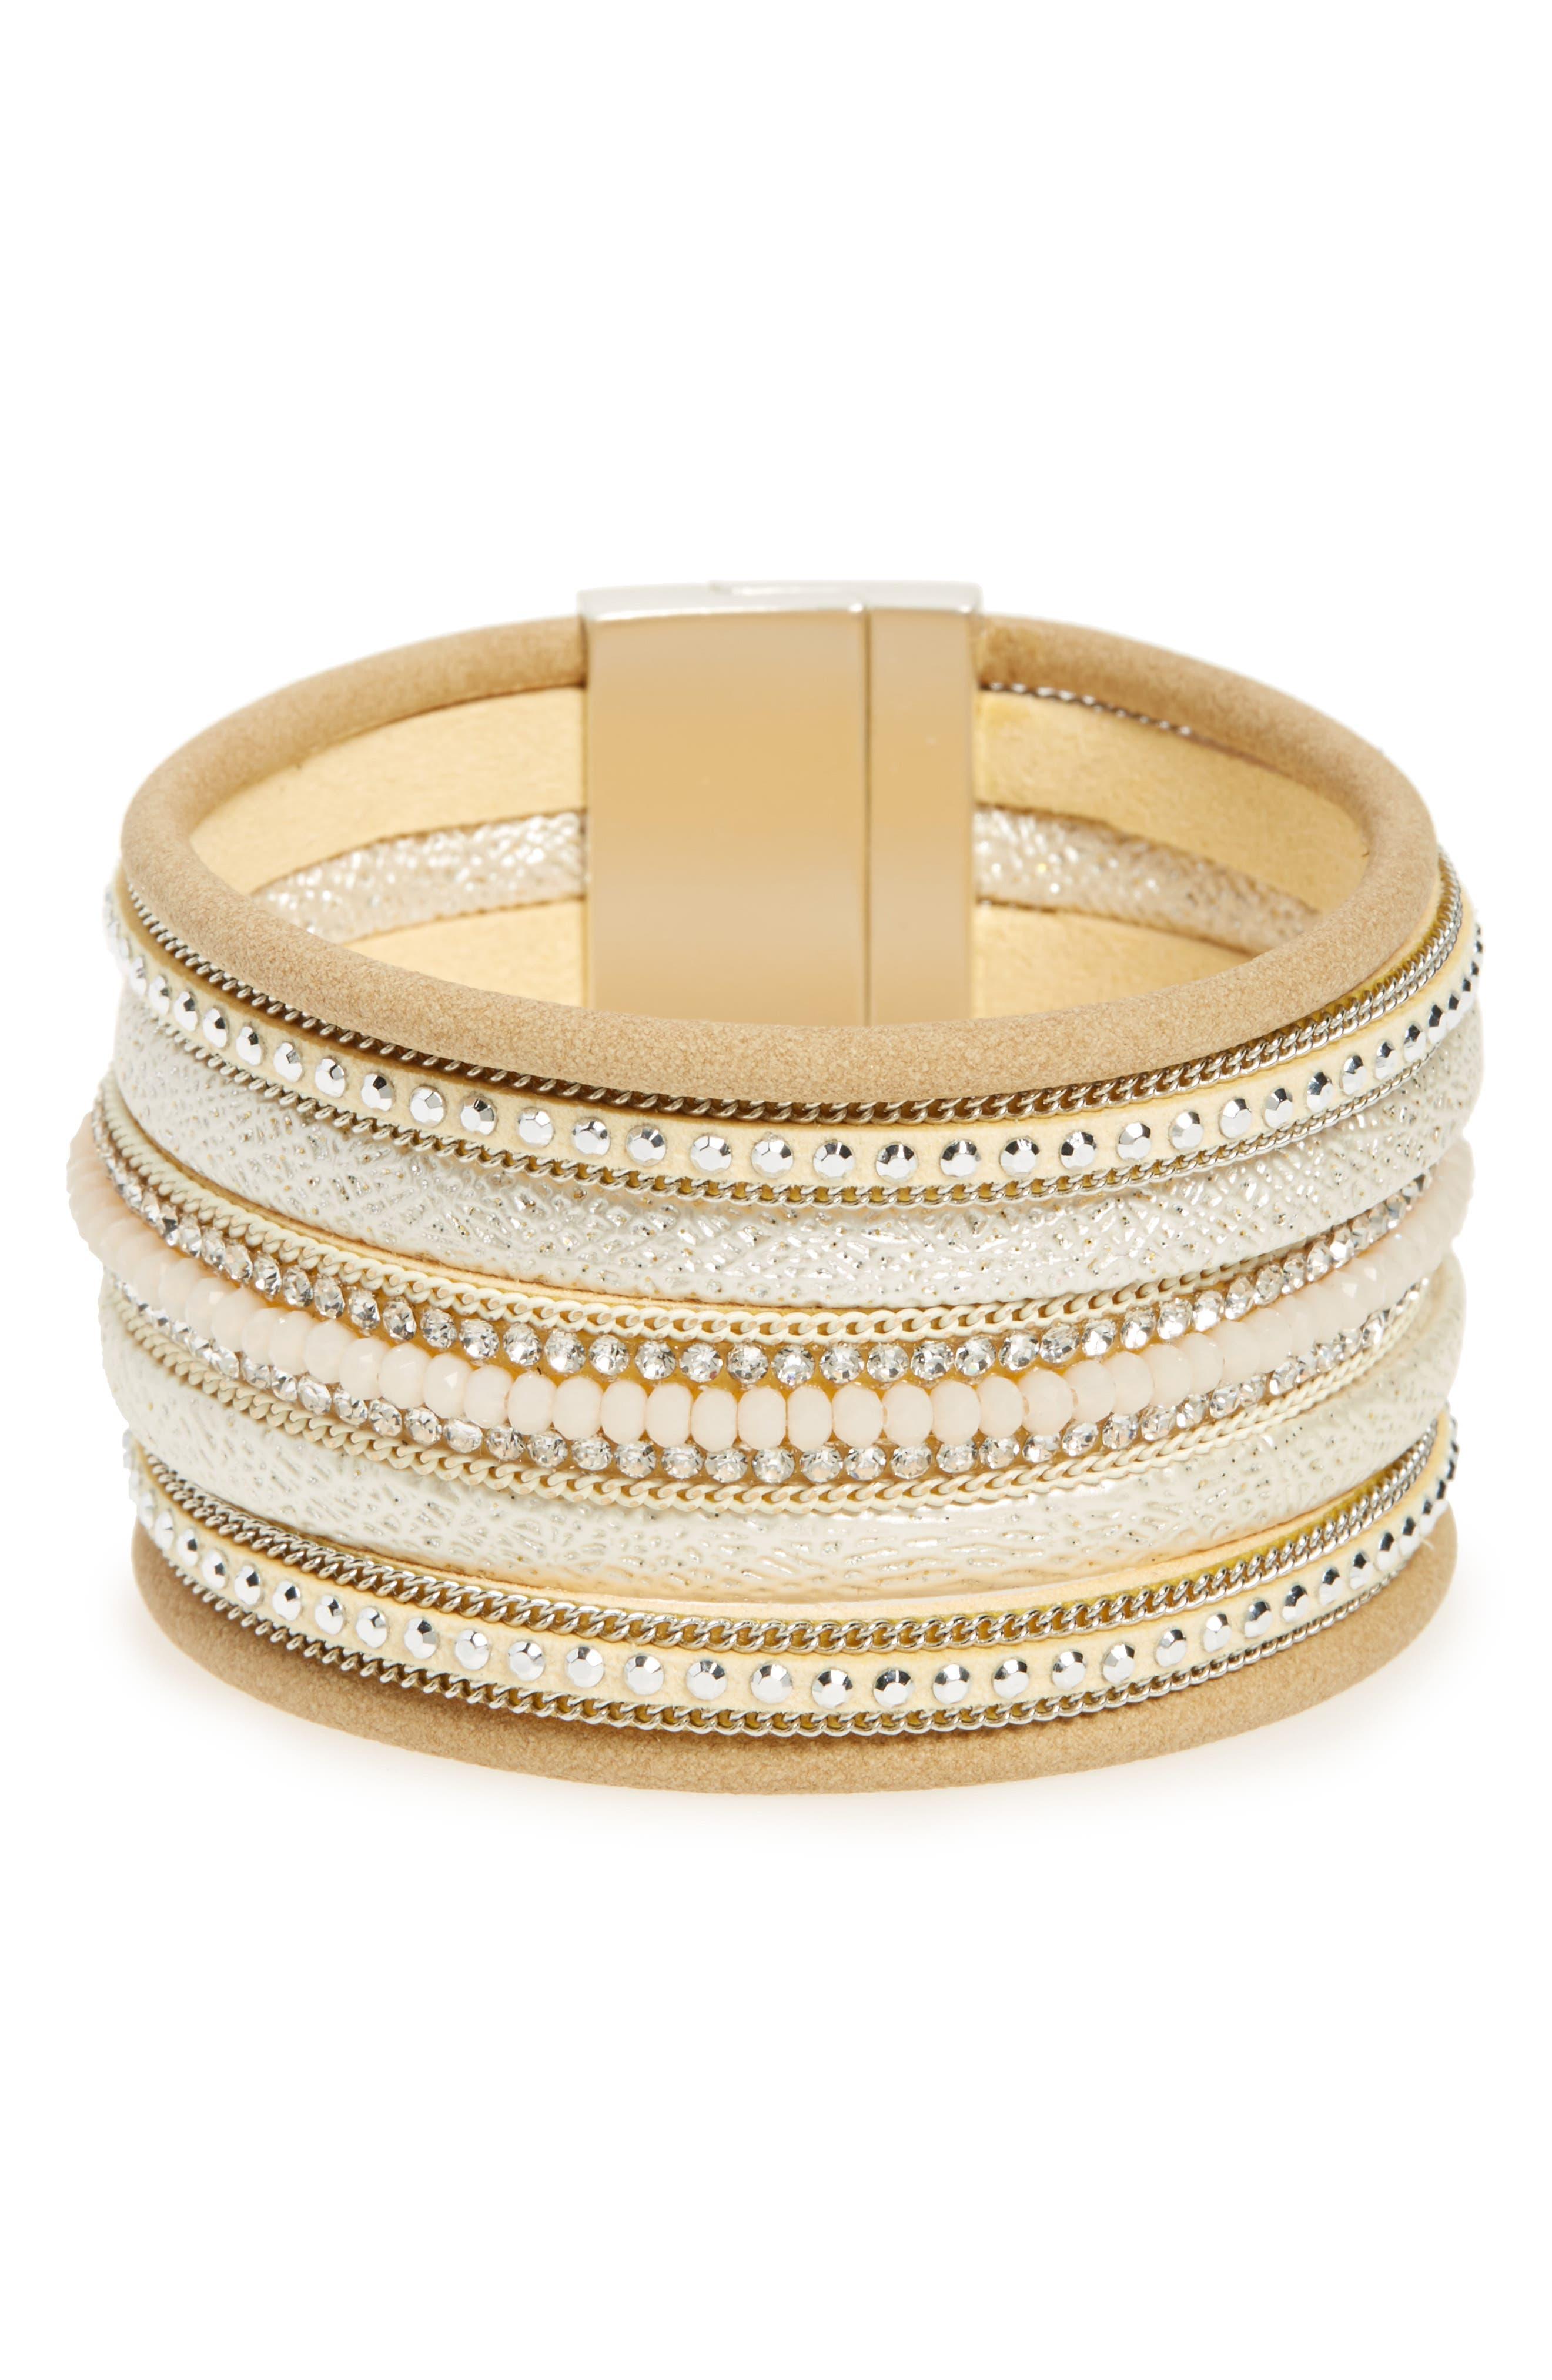 Multirow Bracelet,                             Main thumbnail 1, color,                             200